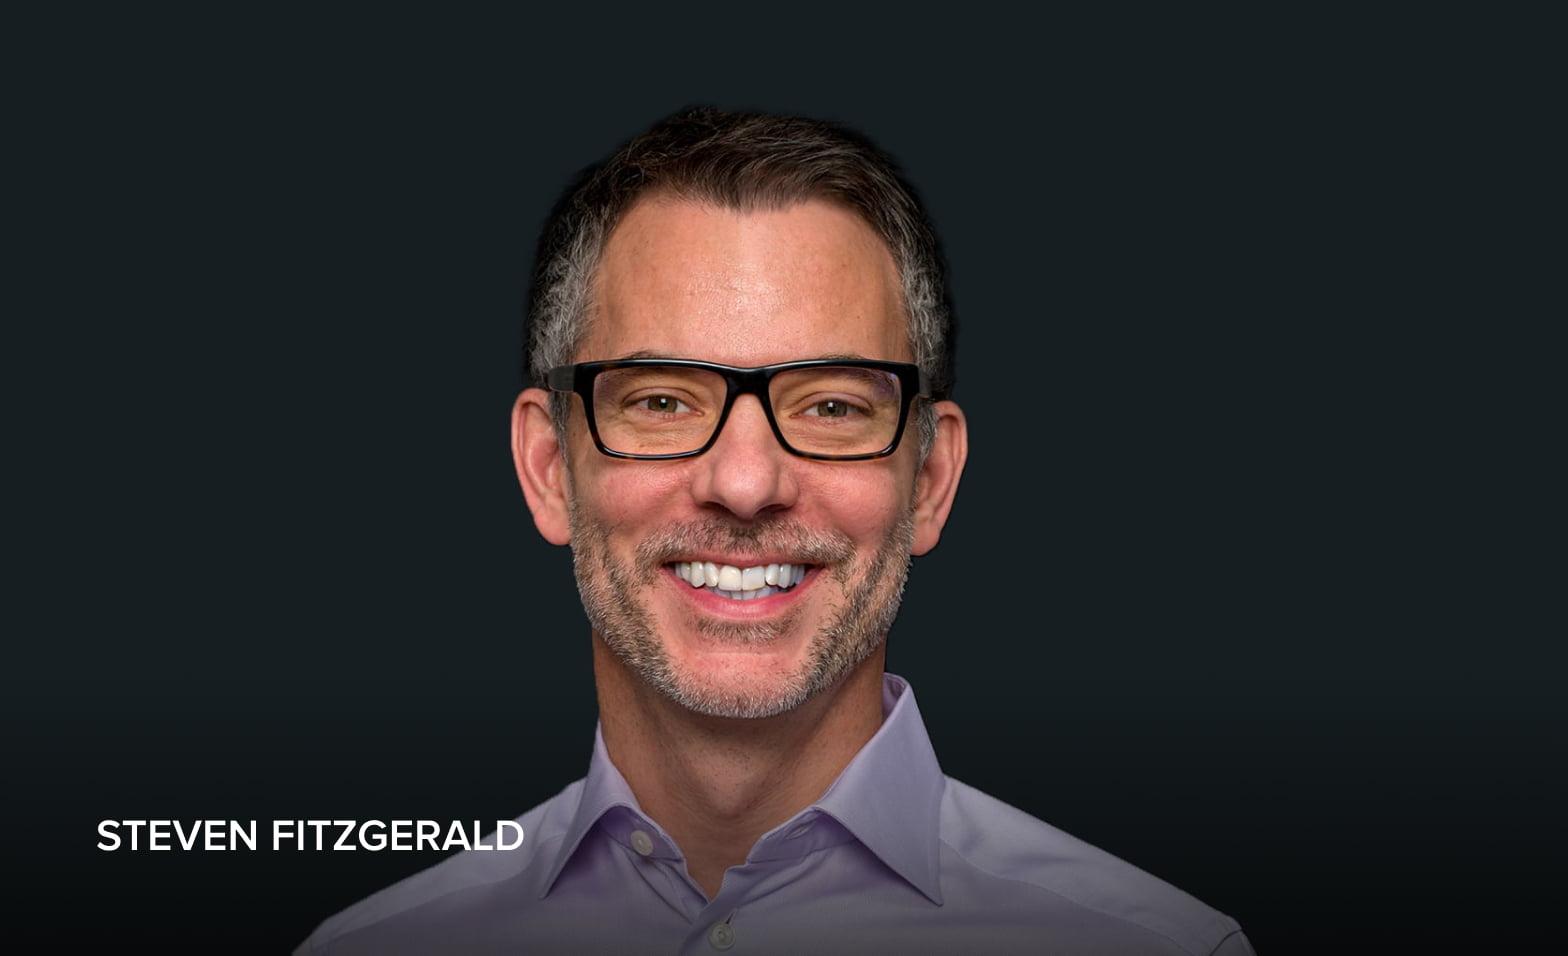 A headshot of Steven Fitzgerald, President